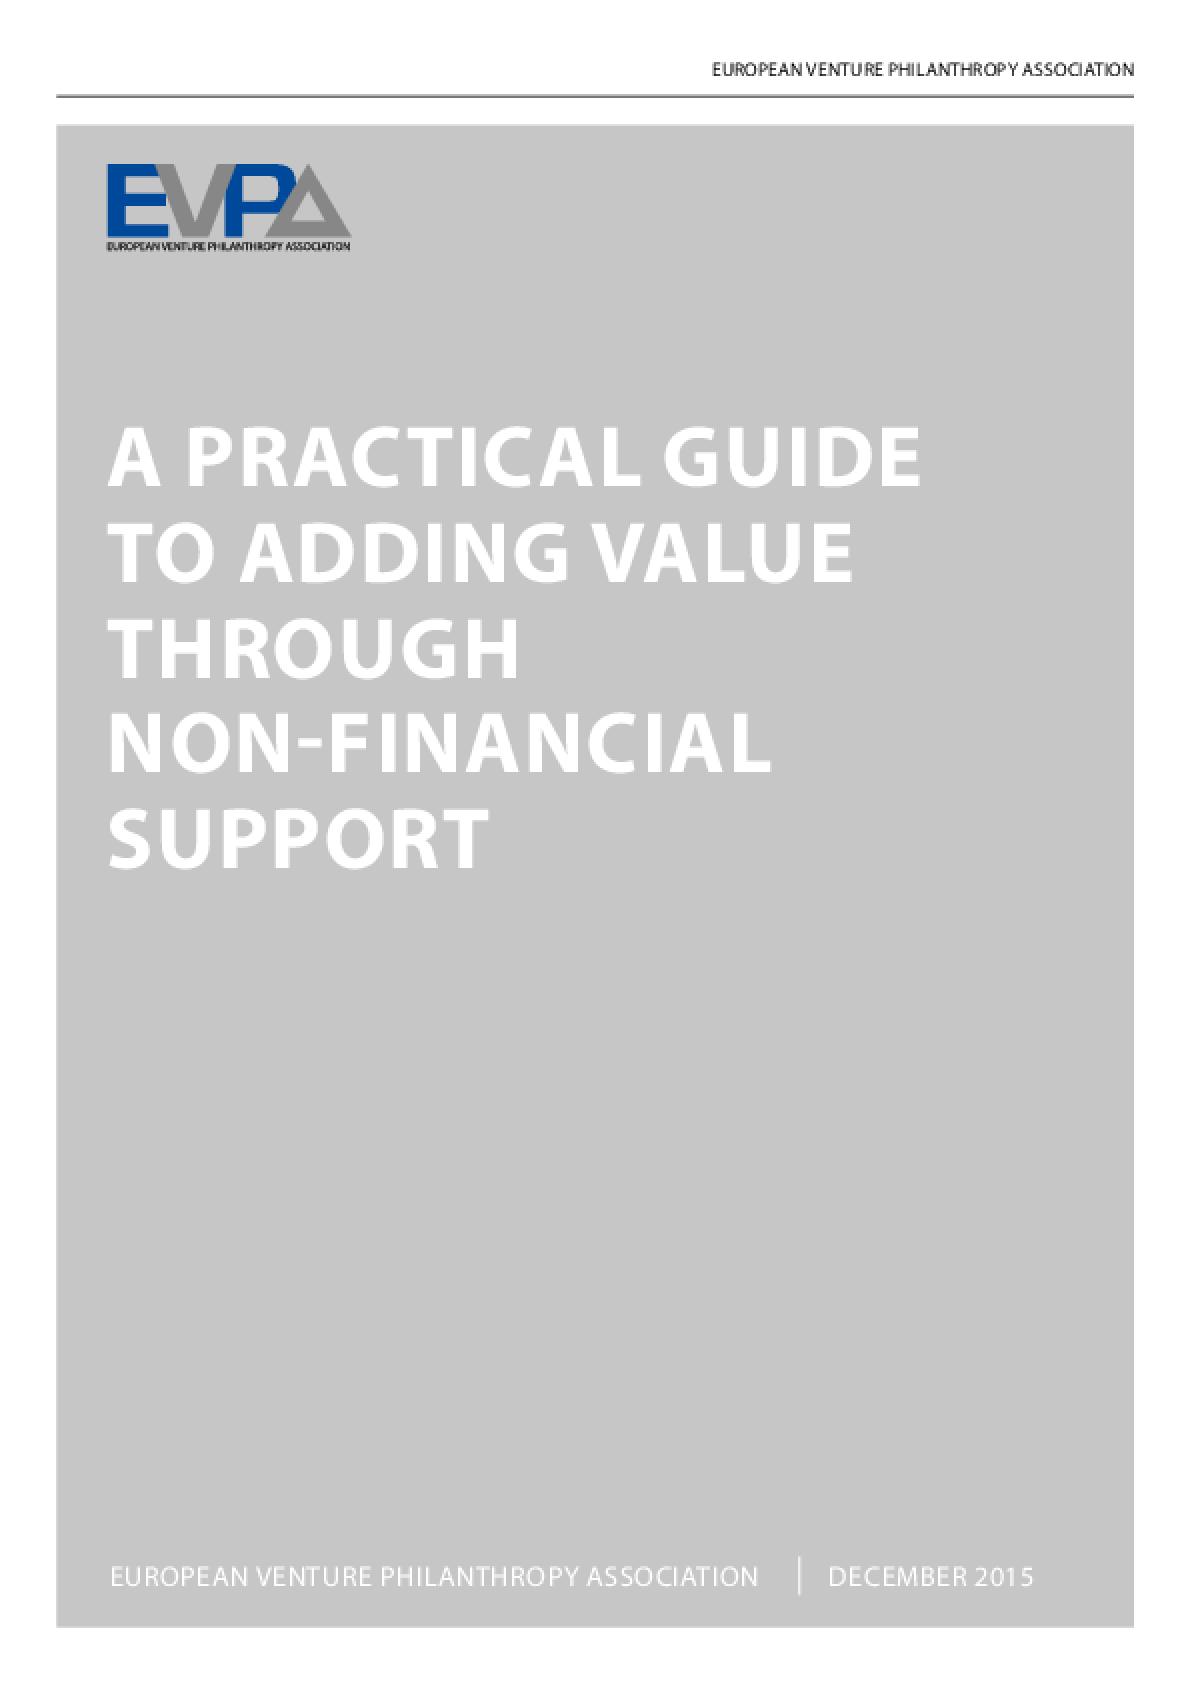 A Practical Guide to Adding Value Through Non-financial Support